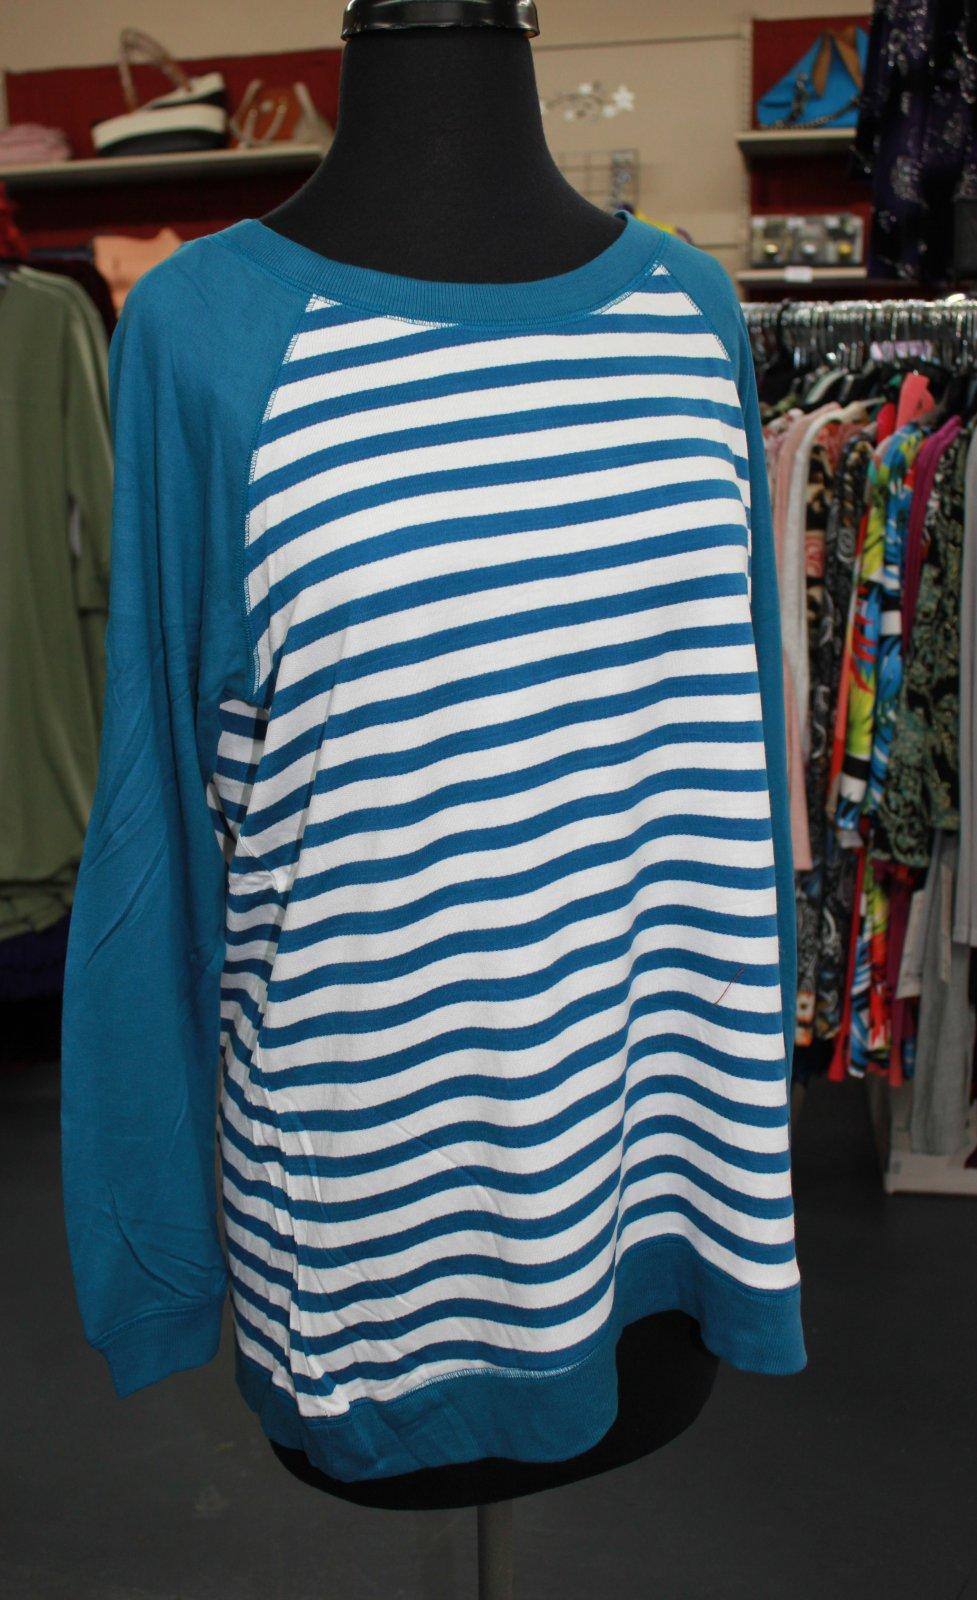 K. Hart Teal/White stripe top